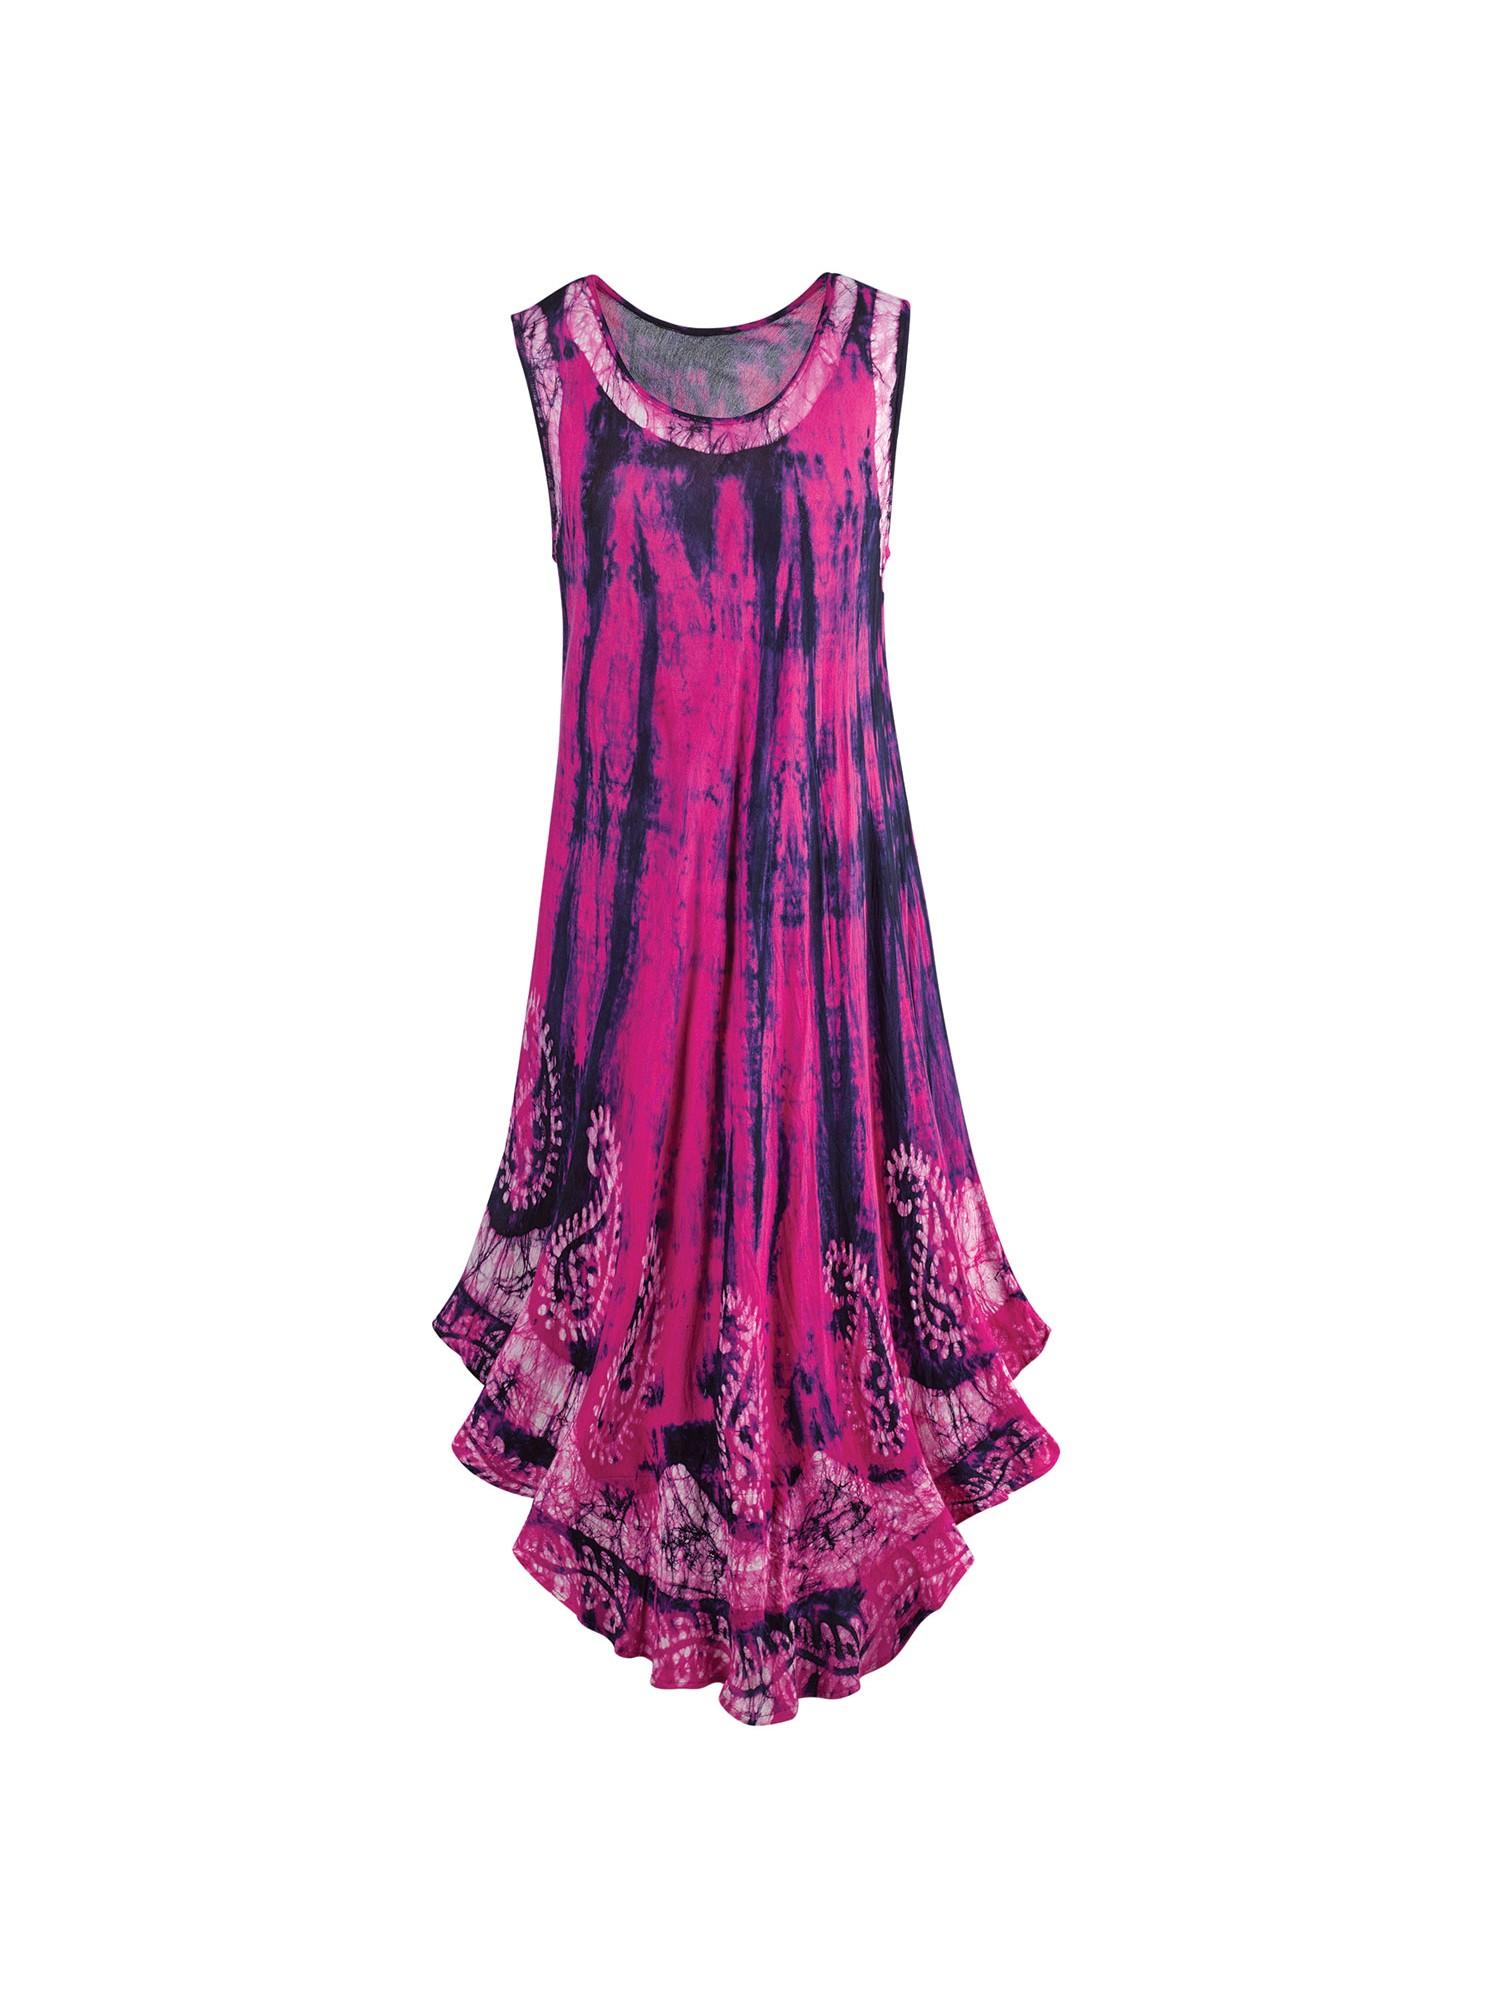 Catalog Classics Women's Hot Pink & Navy Tie-Dye Sundress -Midi Dress Hi-Low Hem